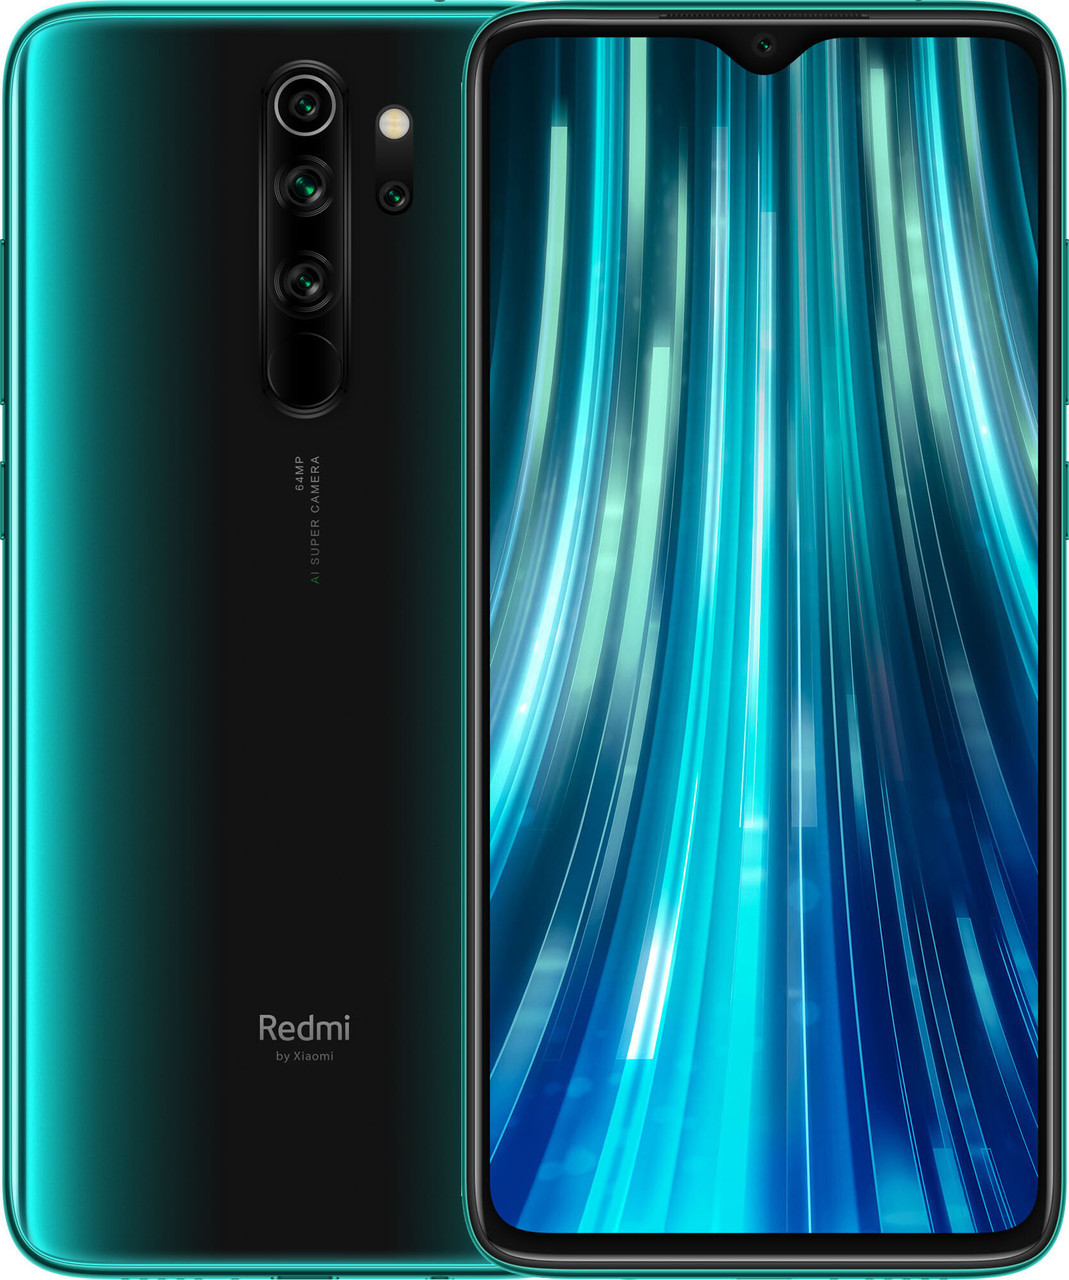 Xiaomi Redmi Note 8 Pro 6/128GB Green Global